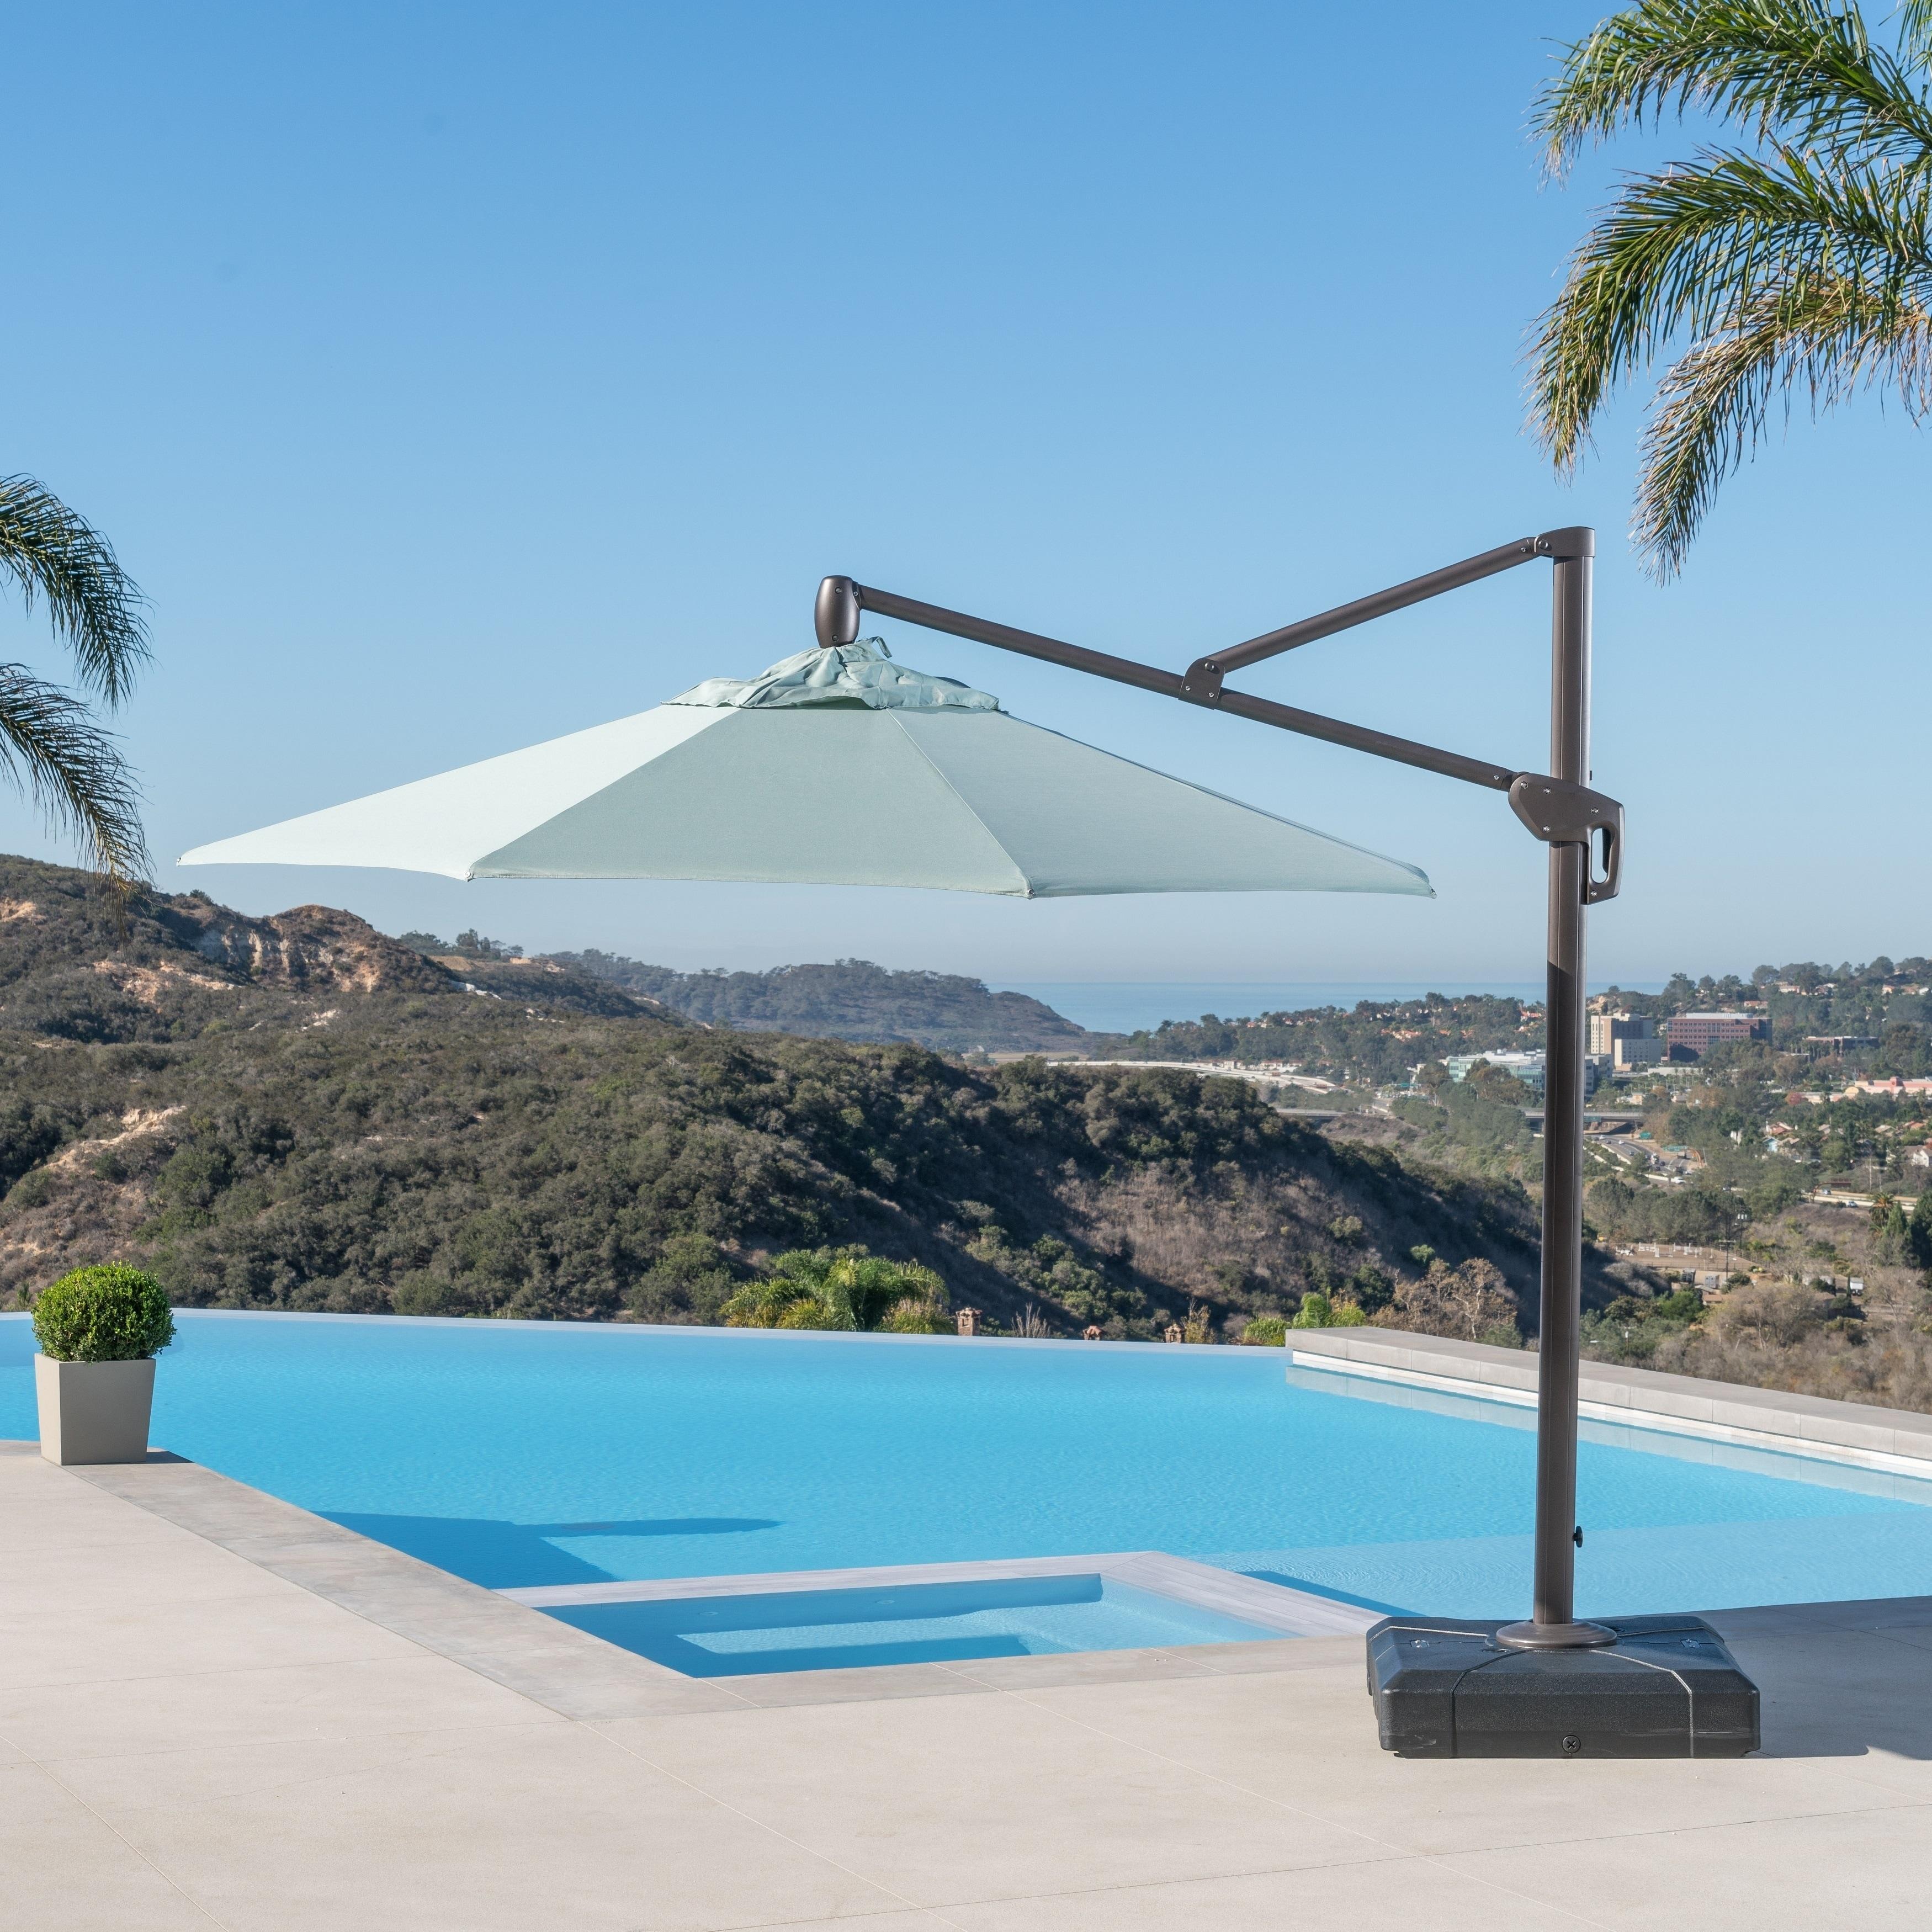 RST Brands Modular Outdoor 10 Foot Round Umbrella In Bliss Blue